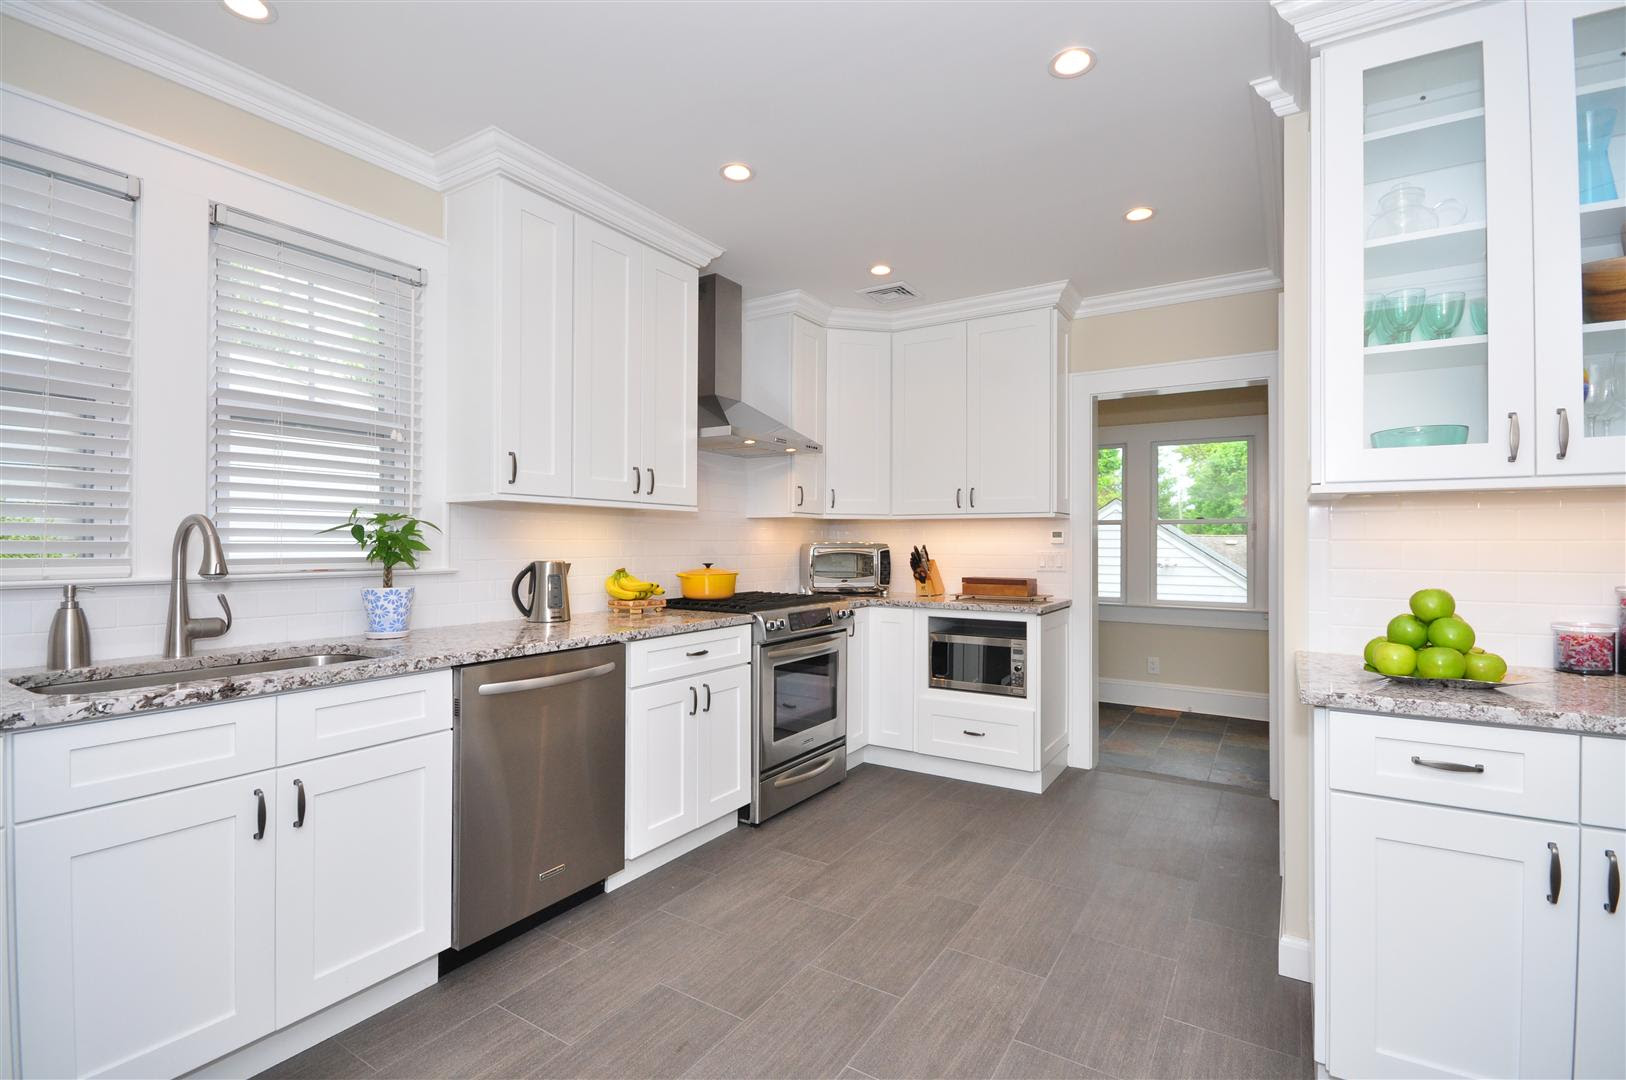 Aspen White Shaker - Ready To Assemble Kitchen Cabinets ...